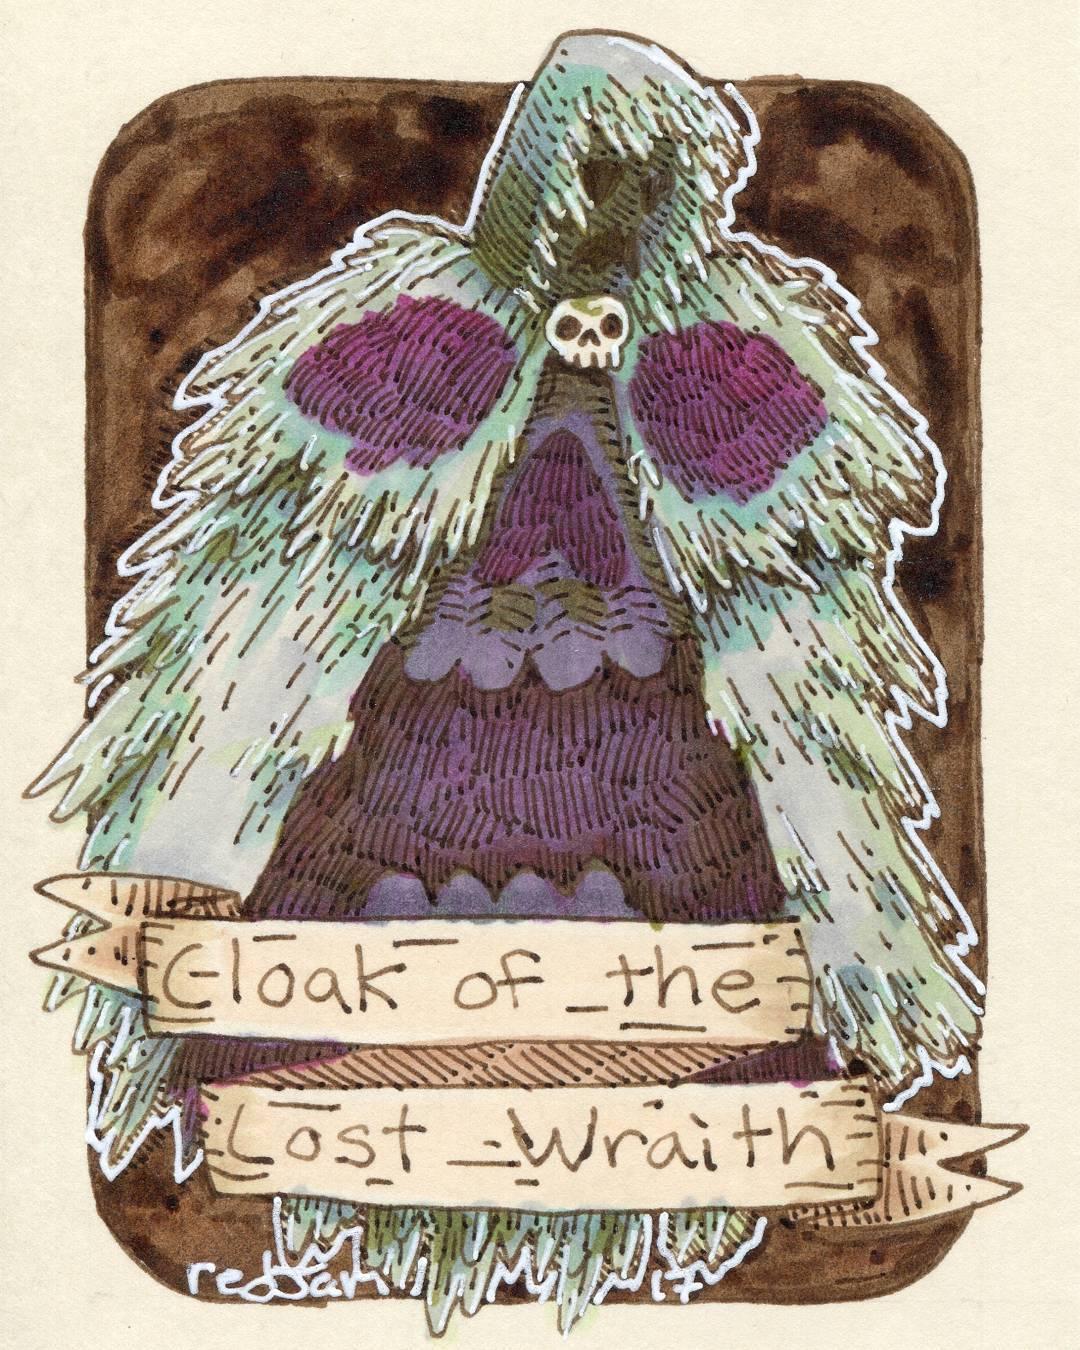 "redjarojam ""Cloak of the Lost Wraith"" - by Jared DeCosta (redjarojam) www.instagram.com/redjarojam (2017-04) © dell'autore tutti i diritti riservati"